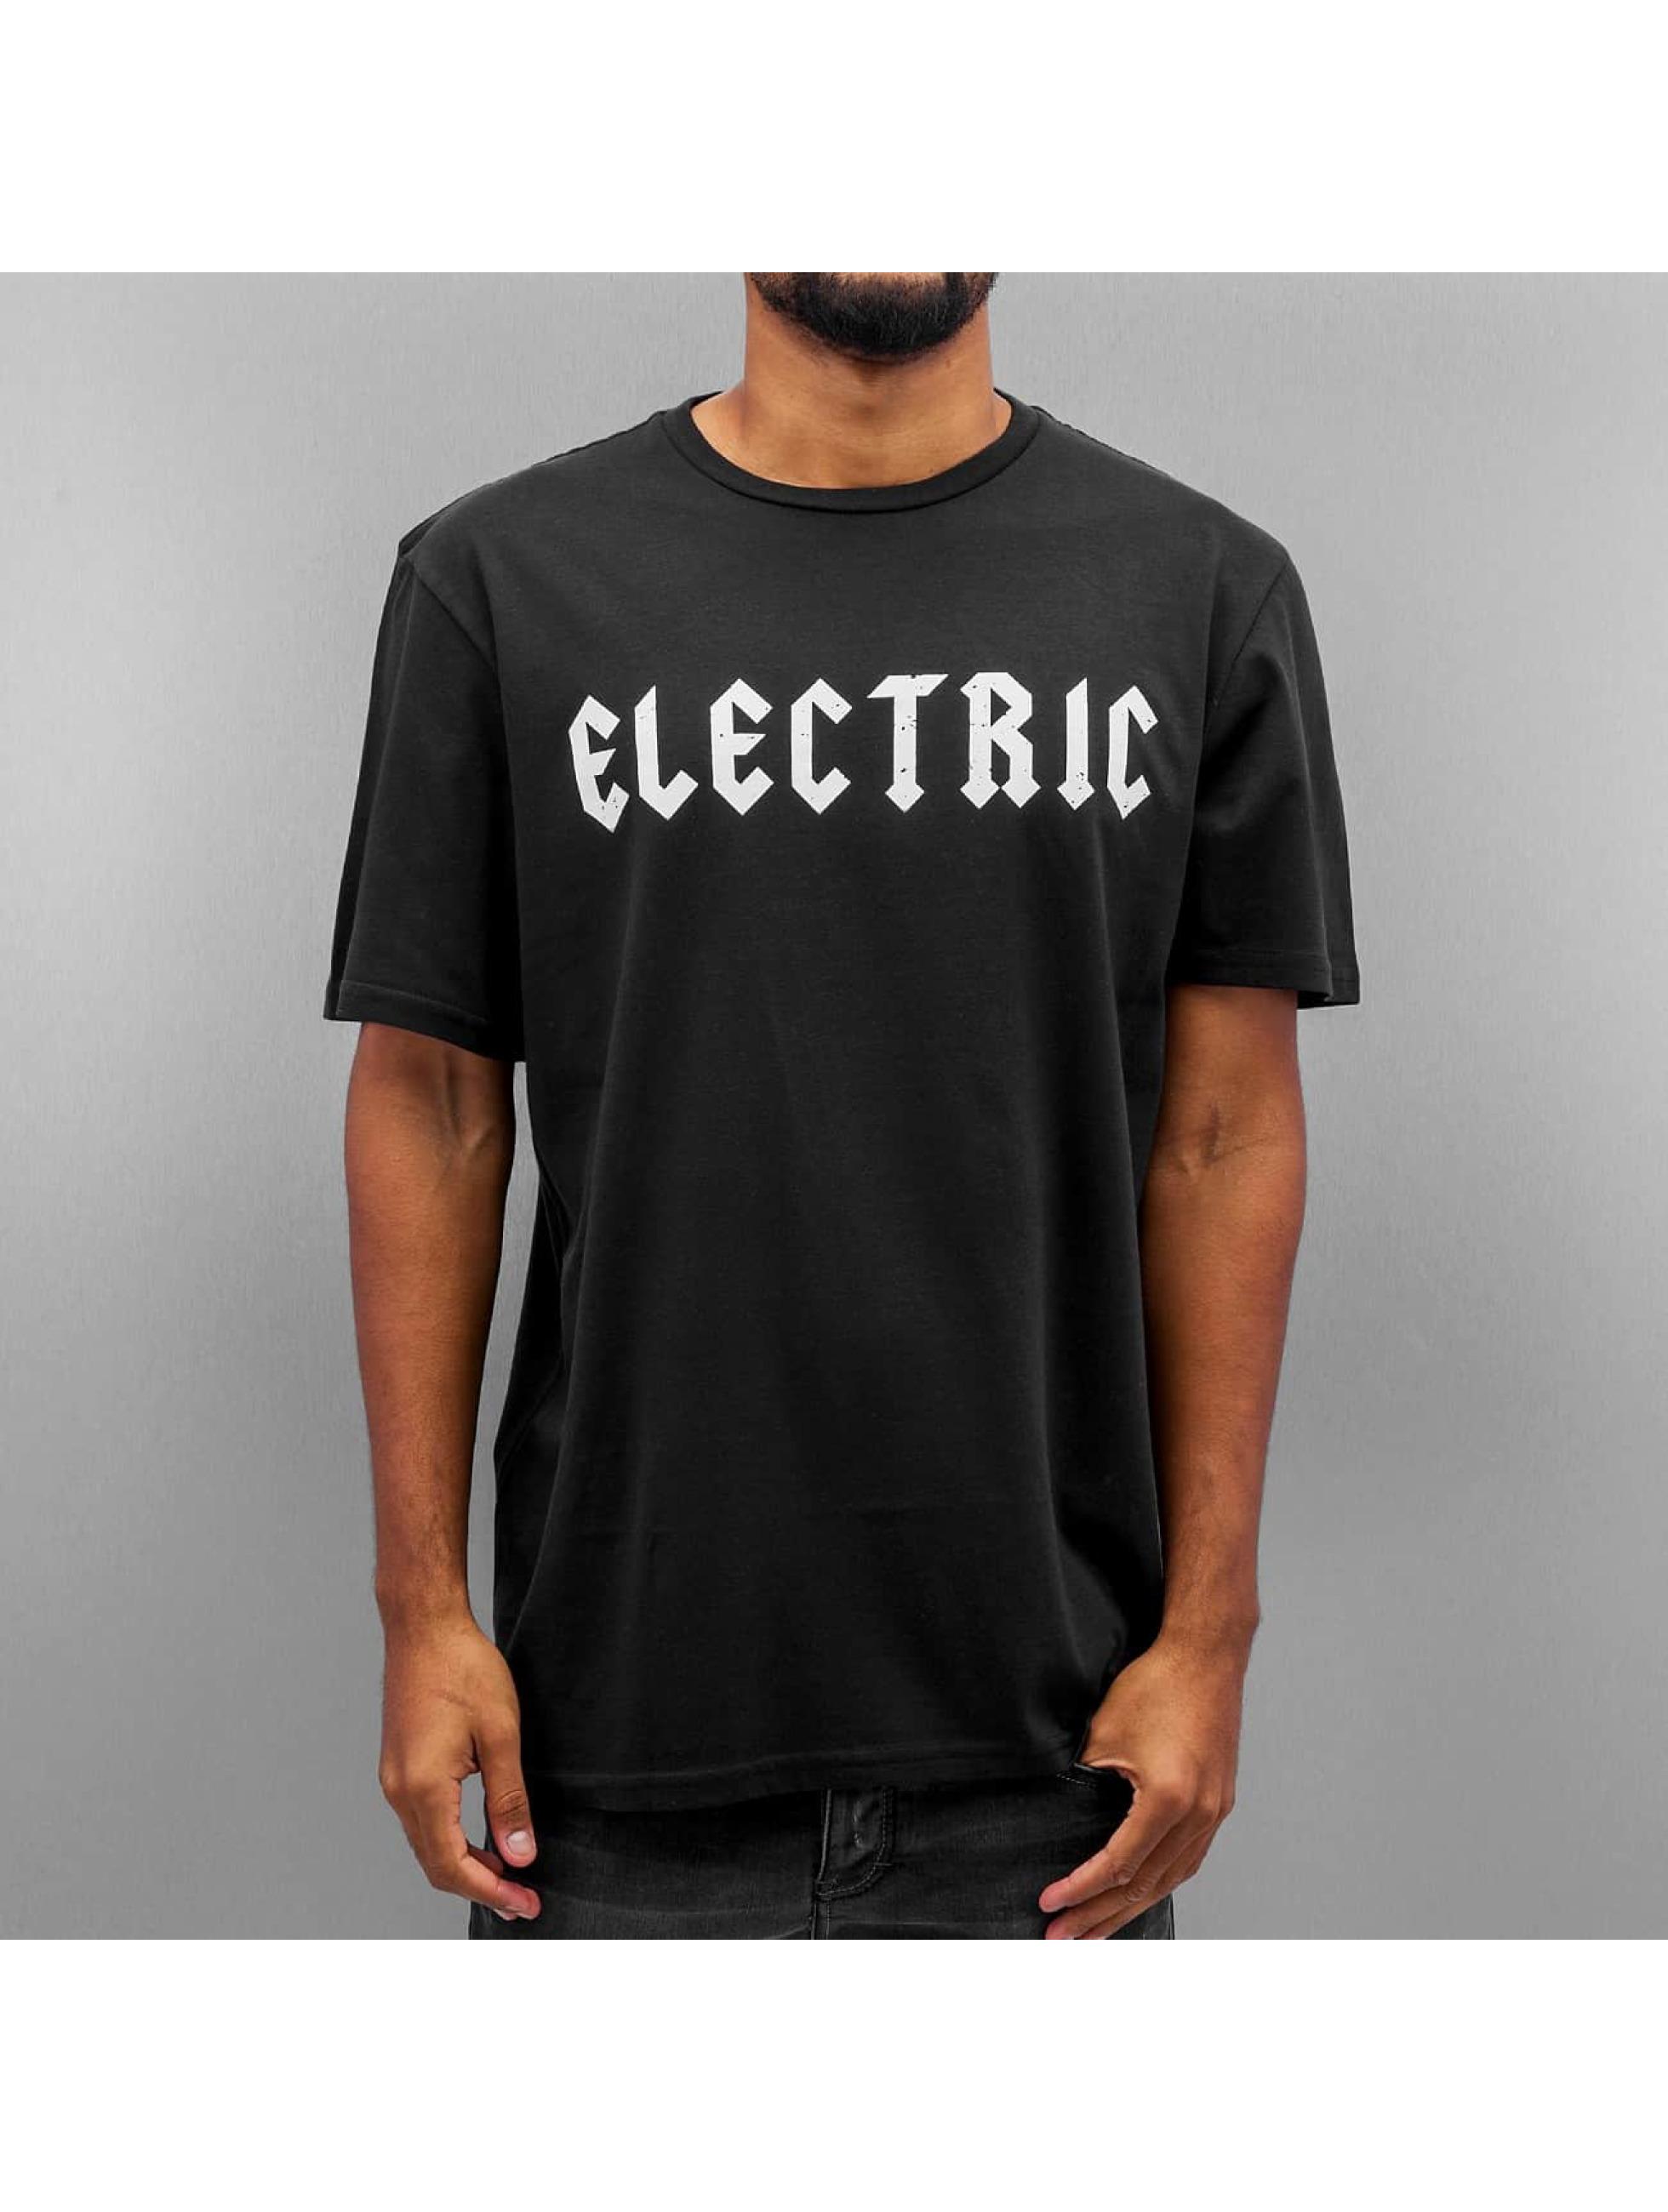 Electric Tall Tees HESSIAN black